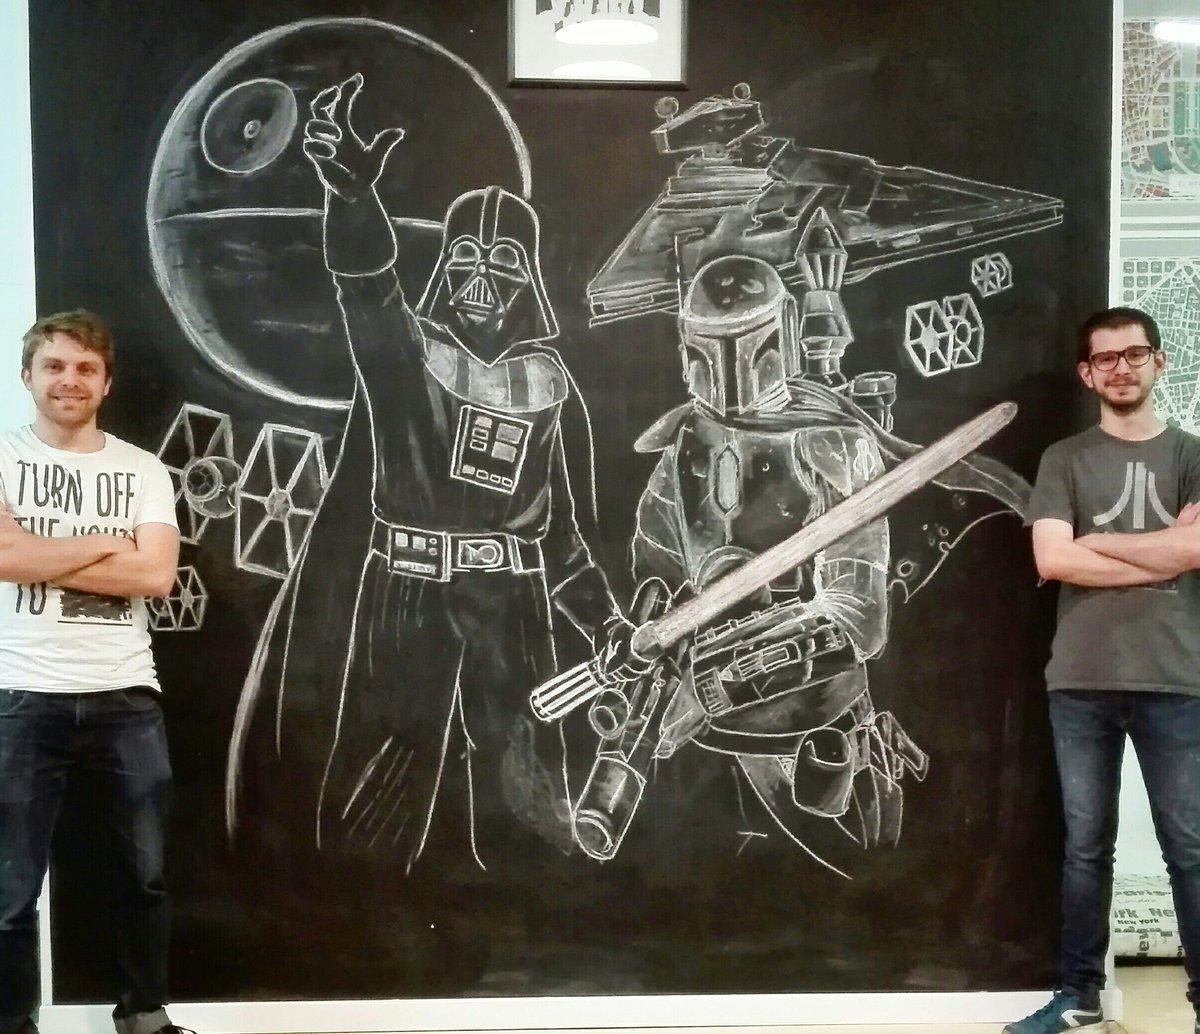 Bobba fett I drew with chalk, I&#39;m the dude at the right. #chalk #blackboard #bobbafett #mandalorian #darthvader #starwars #deathstar #empore #fanart #streetart #misc #nerd #geek #bountyhunter<br>http://pic.twitter.com/6FPWtEVfVH